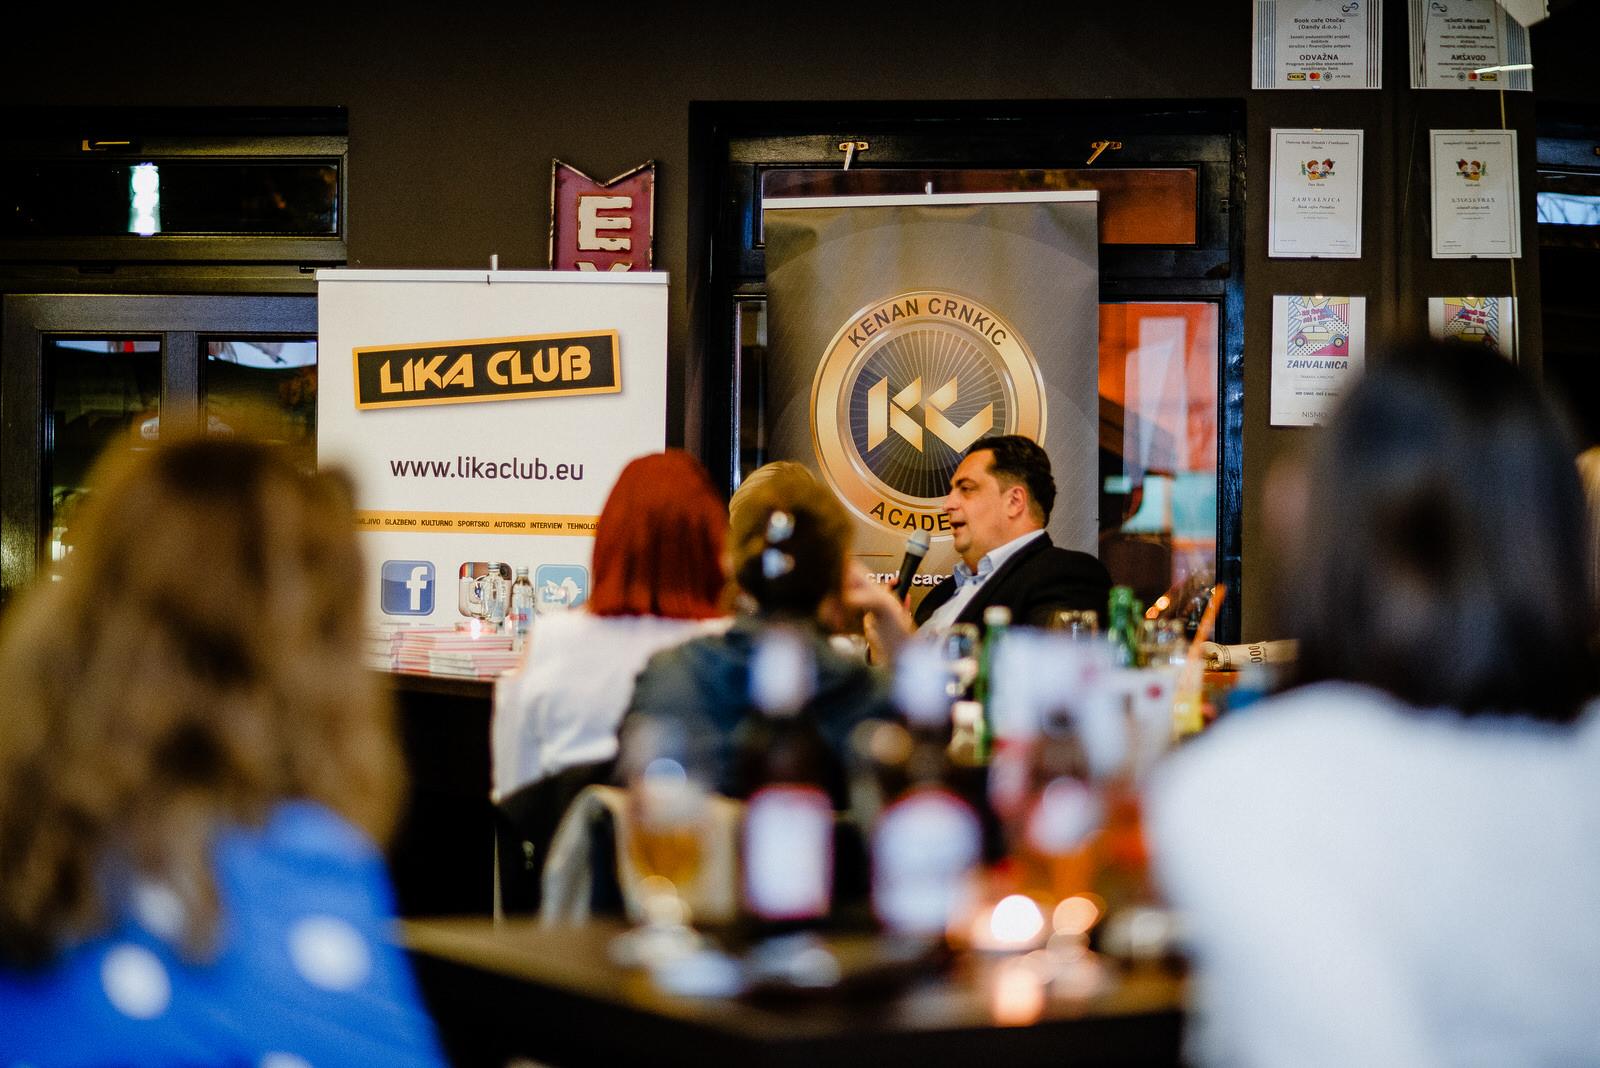 likaclub_otočac_book-caffe-paradisso_kenan-crnkić_2019-16